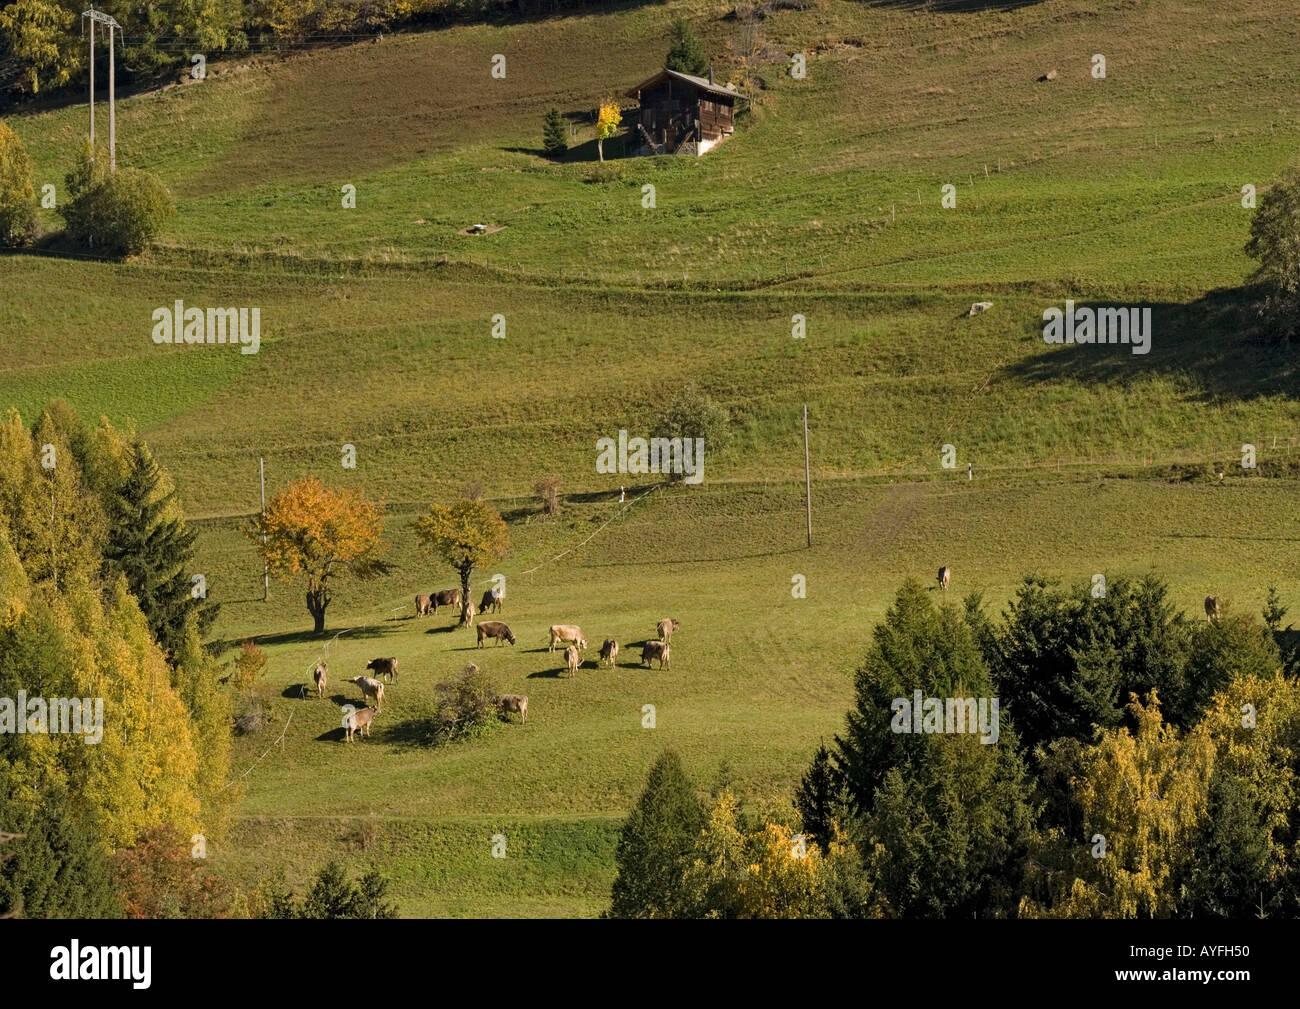 Cattle grazing open fields in alps South Switzerland near Disentis Autumn - Stock Image